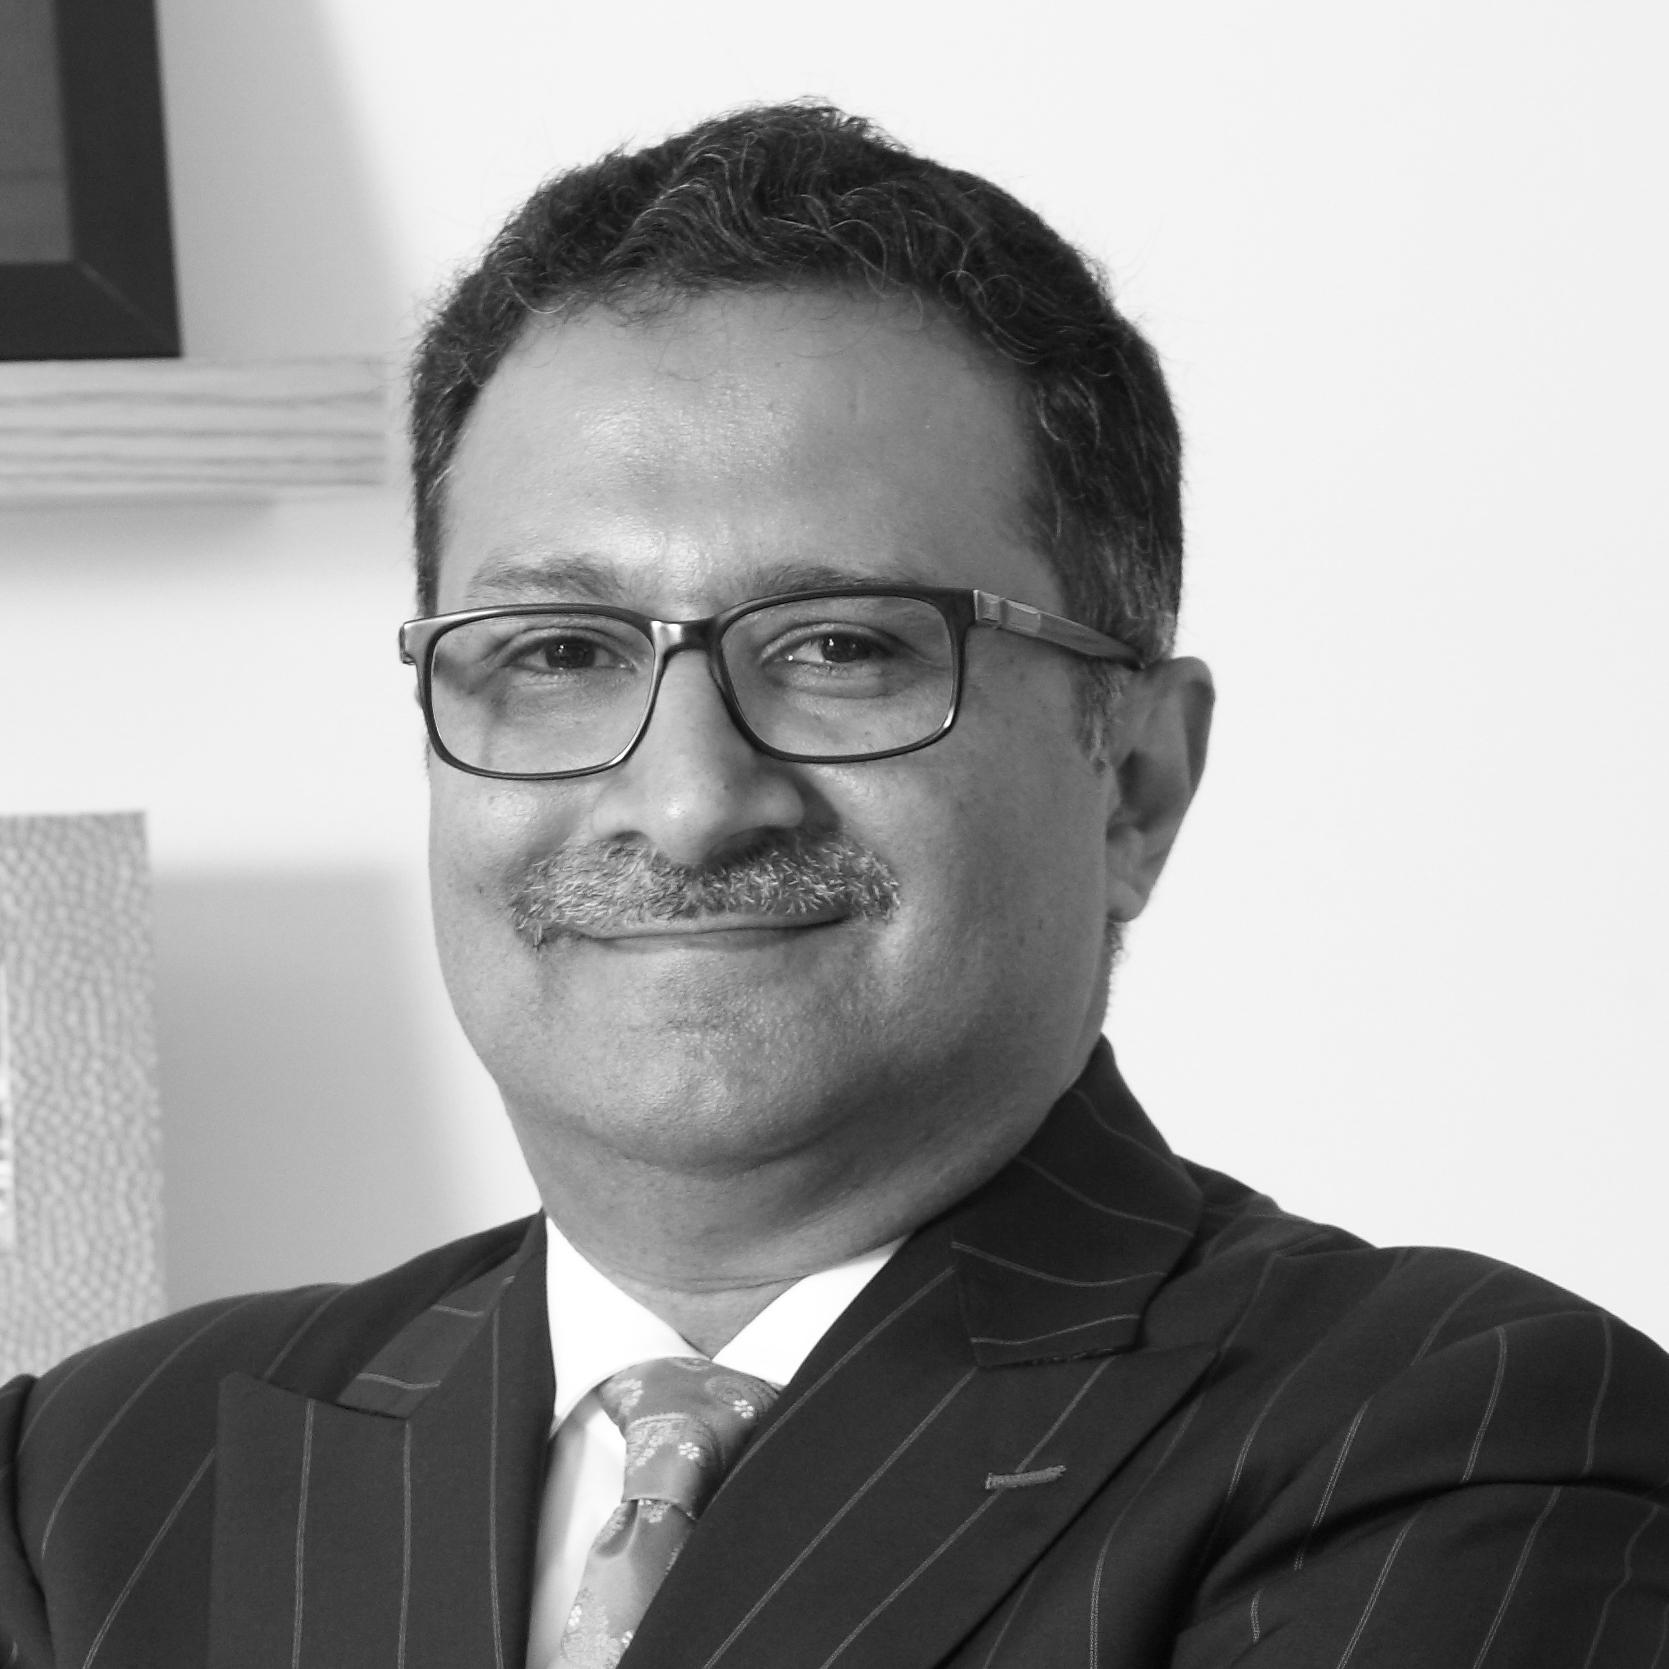 Navid Fazil